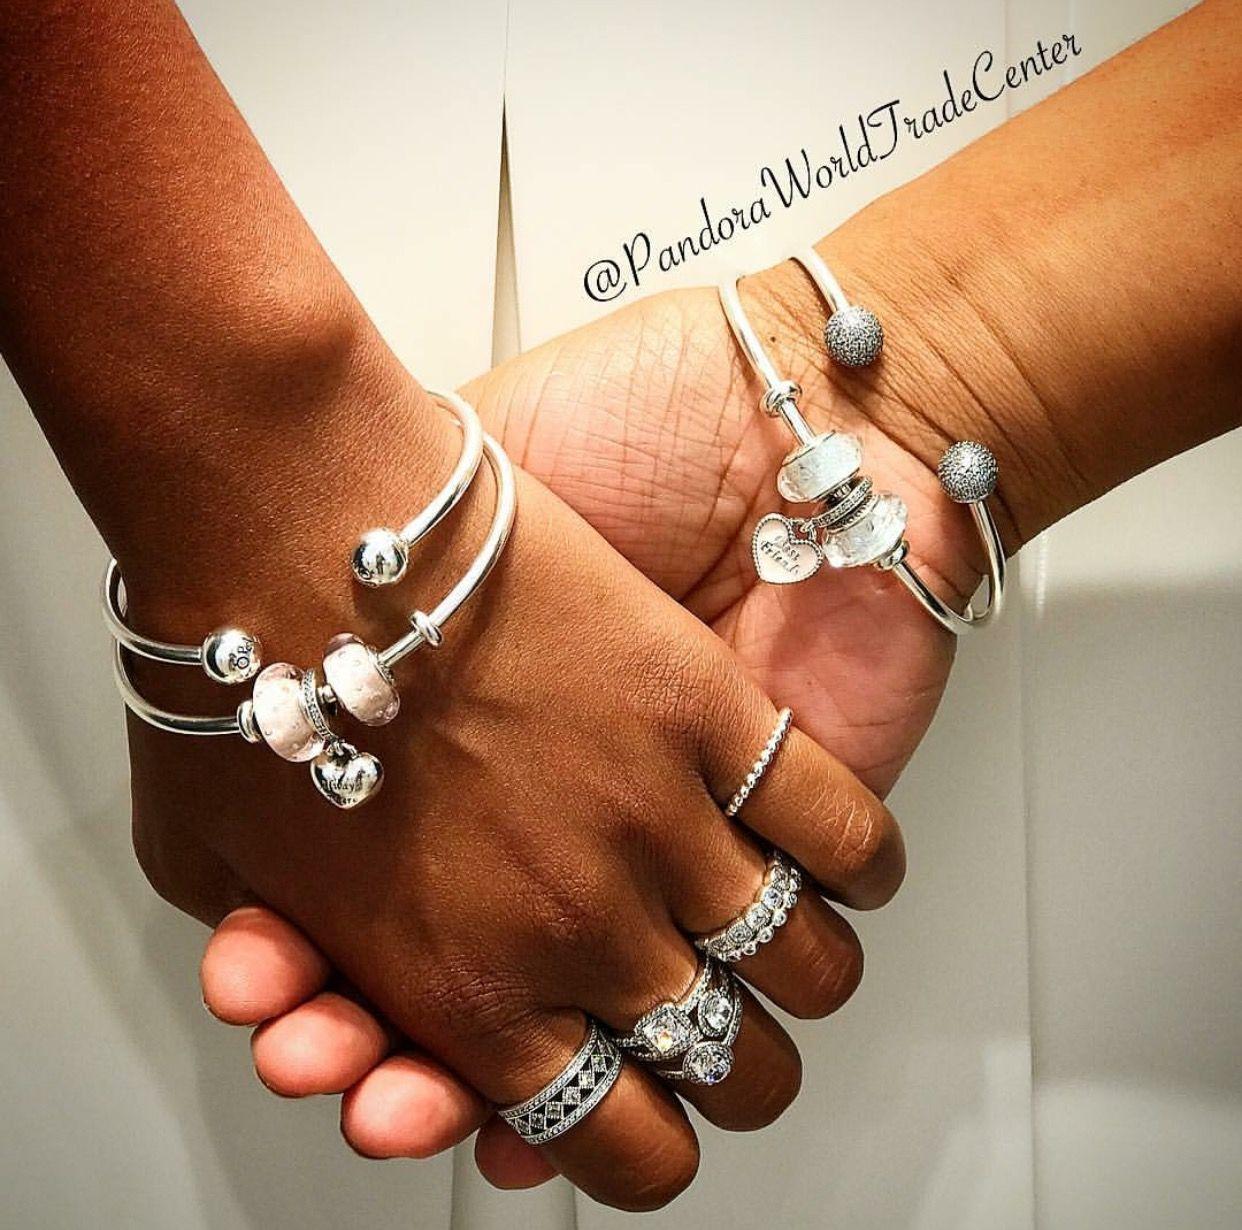 0471c7753 Pandora Open Bangle, Pandora Rings, Pandora Bracelets, Pandora Jewelry,  Girls Jewelry,